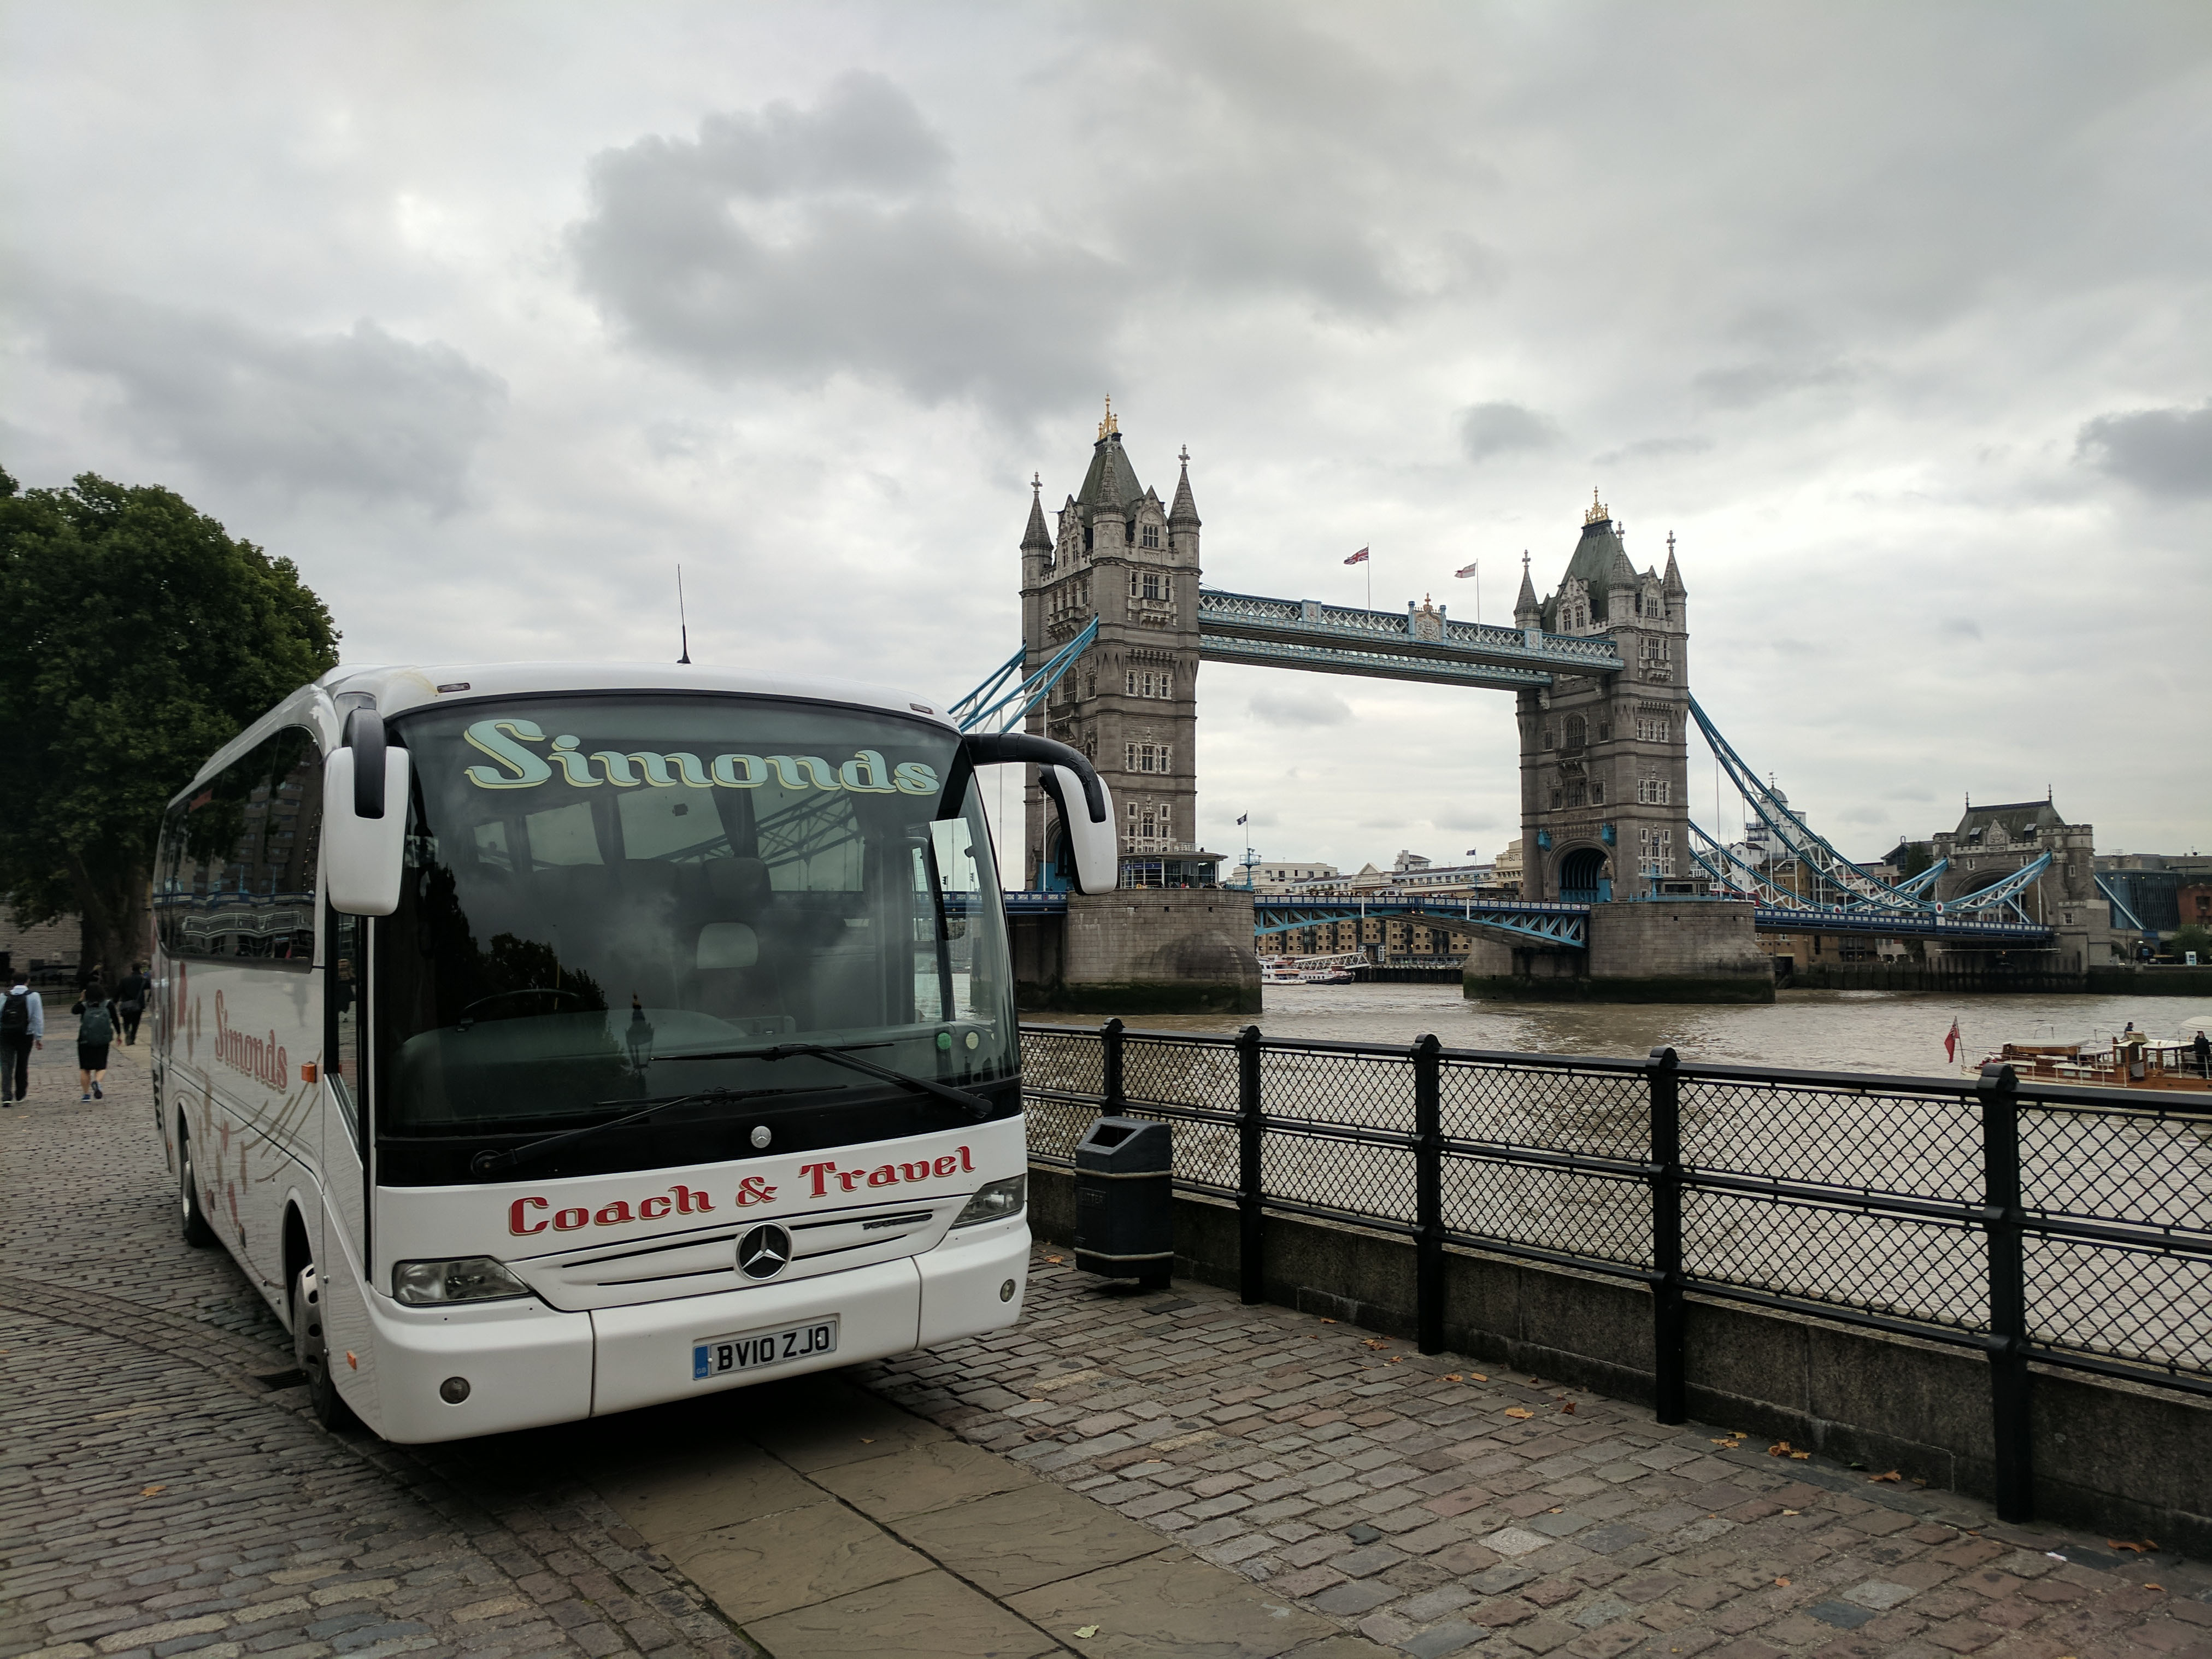 Simonds Coach & Travel